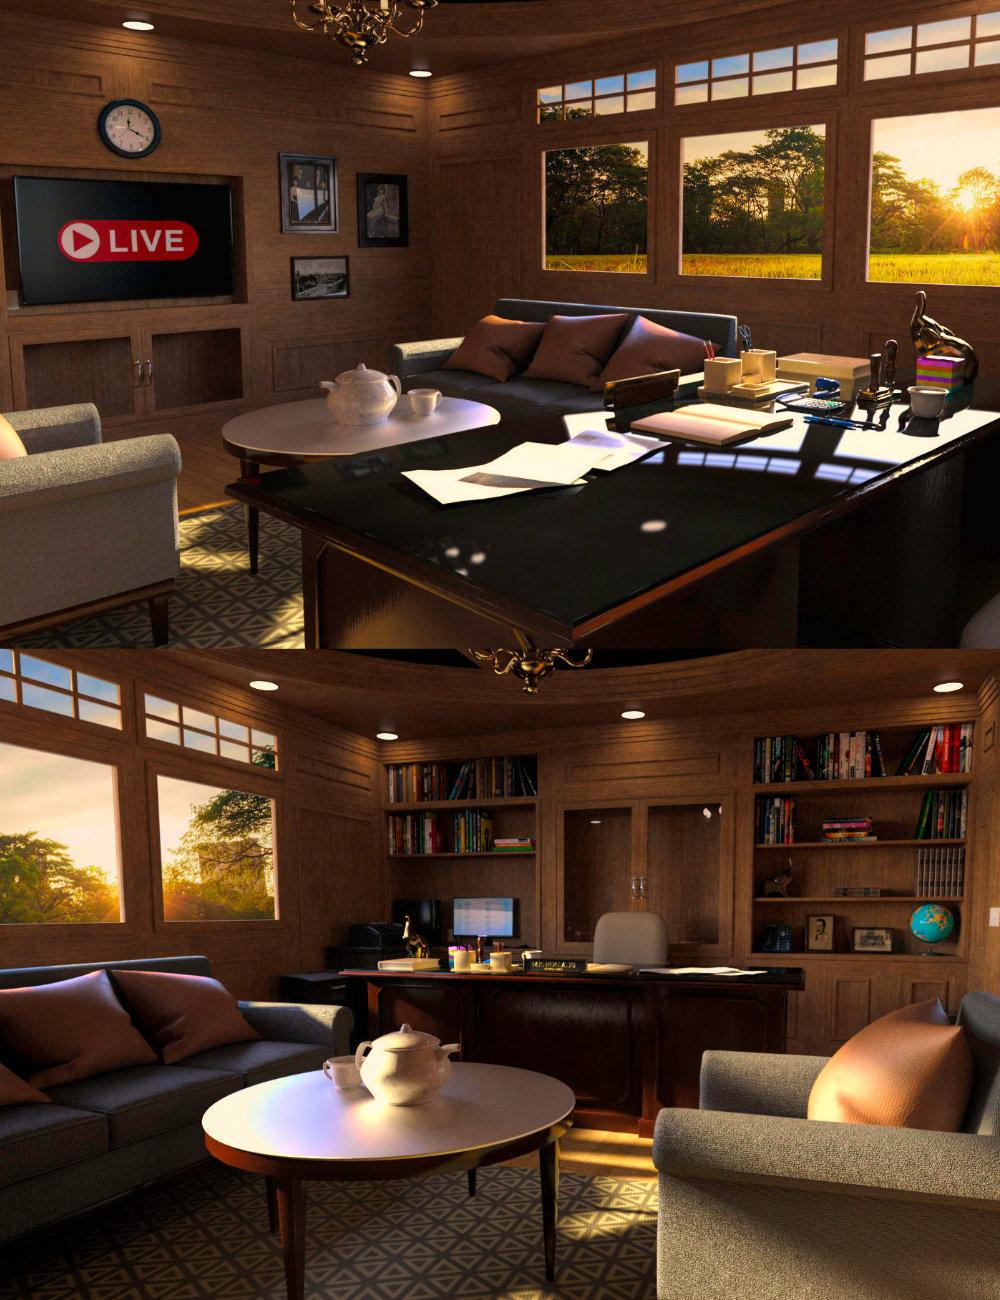 FG Modern Dean's Office by: PAN StudiosFugazi1968Ironman, 3D Models by Daz 3D